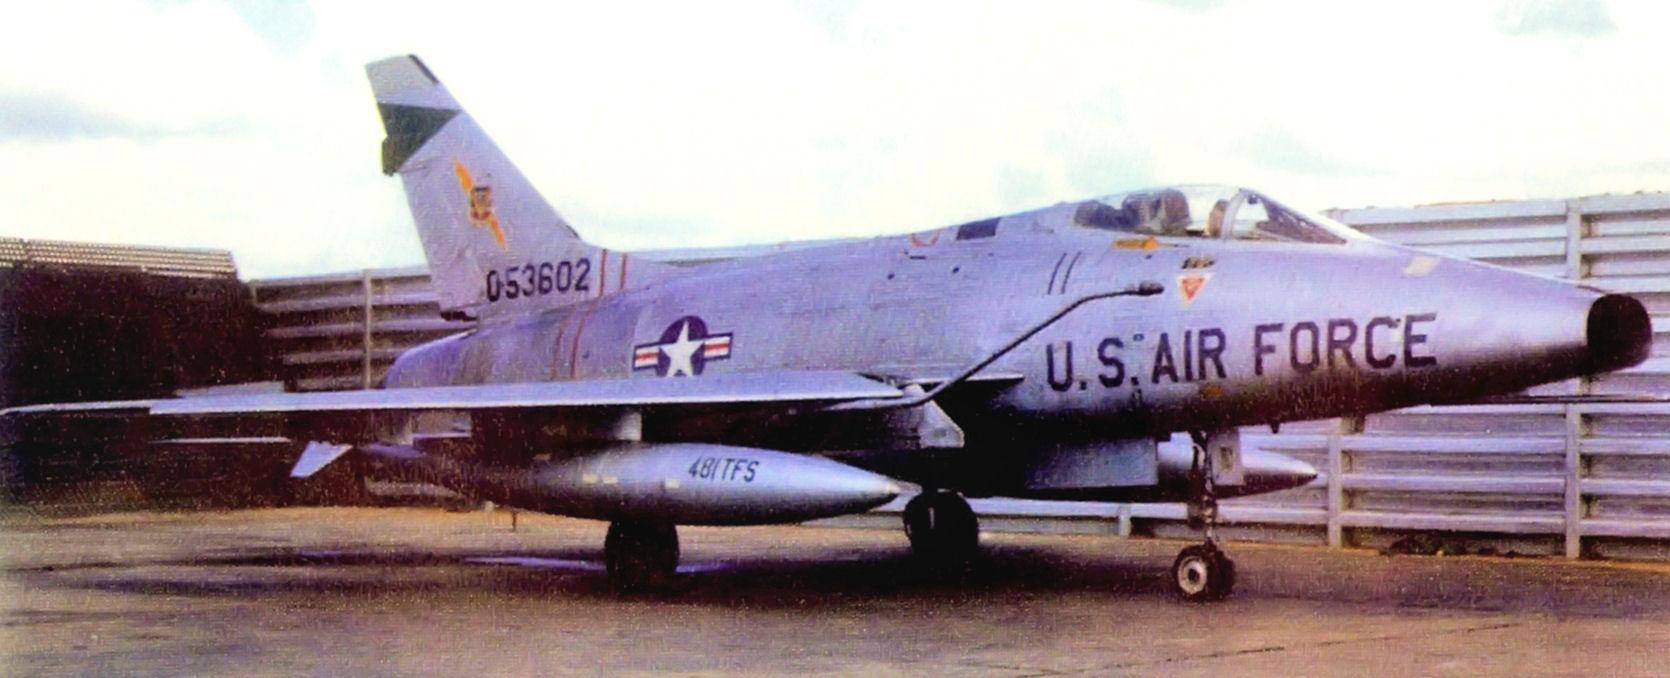 481st_TFS_North_American_F-100D-25-NA_Super_Sabre_55-3602.jpg